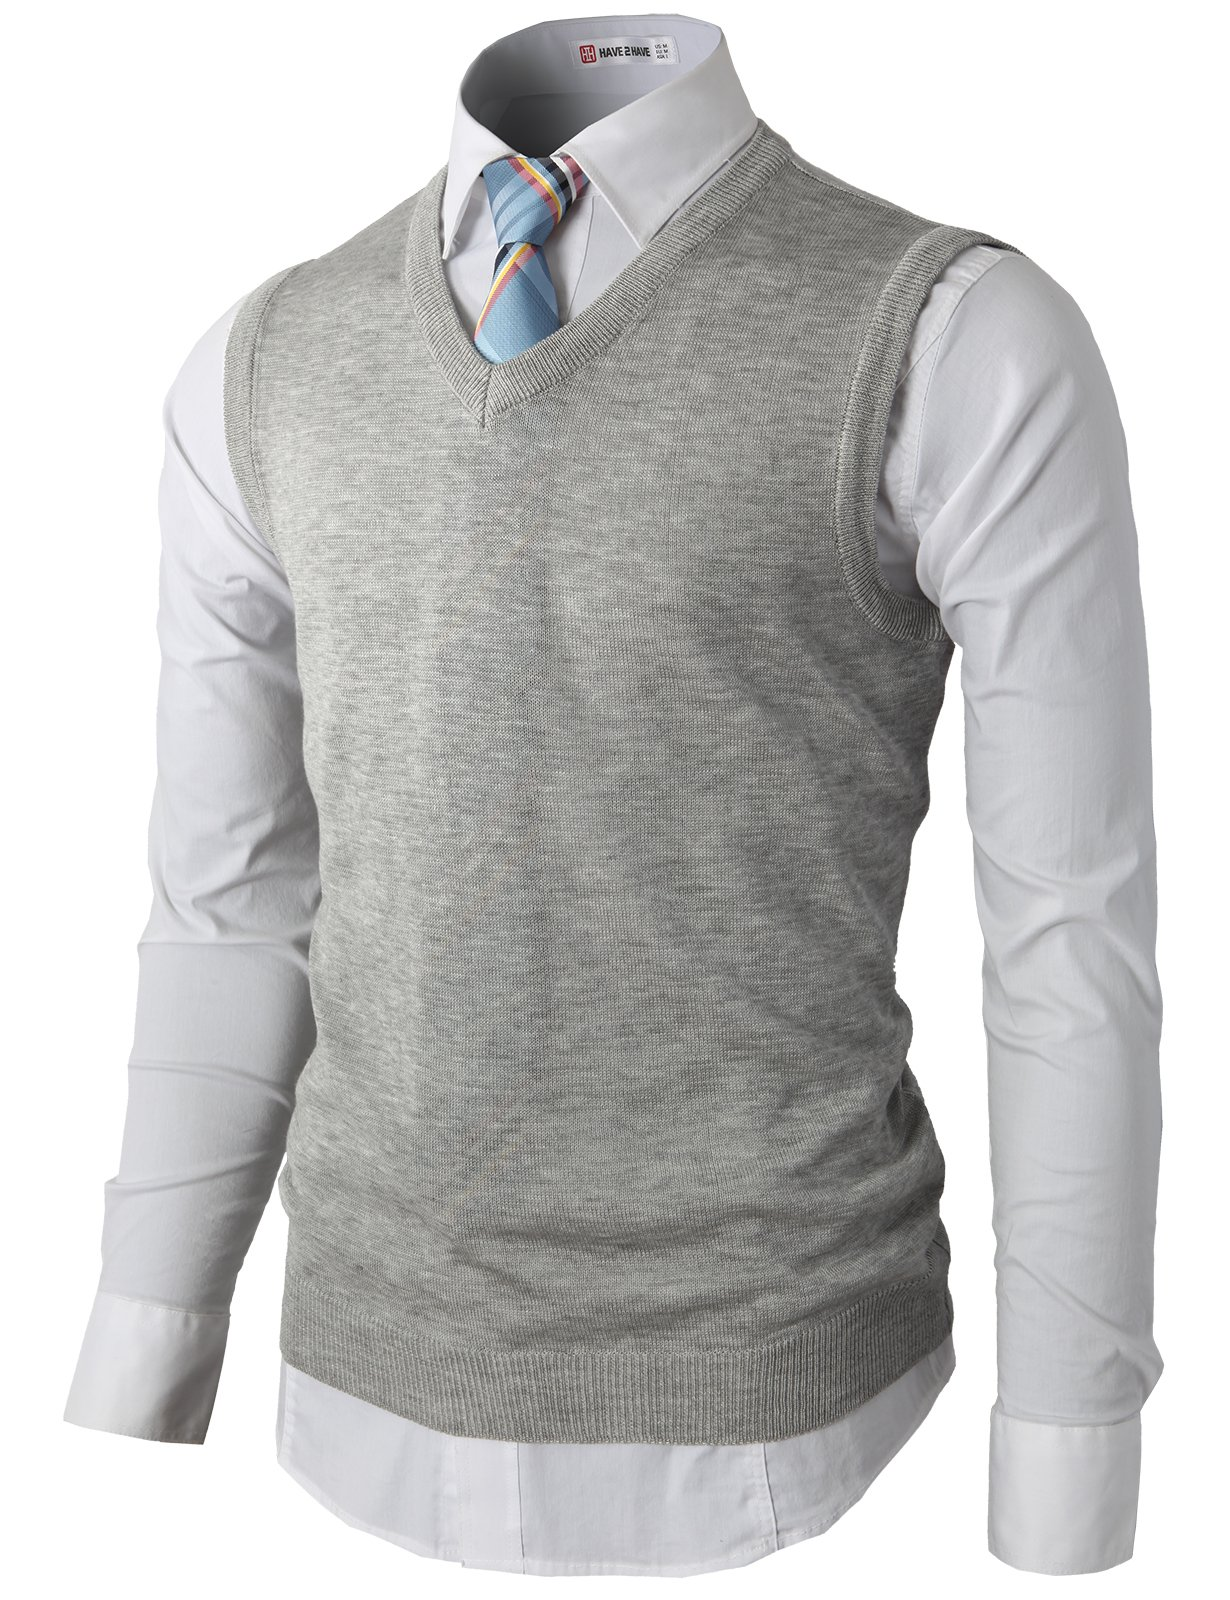 H2H Men's Pima Cotton Thermal Sweater Vest With Ribbed V-neckline GRAY US L/Asia XL (KMOV050)